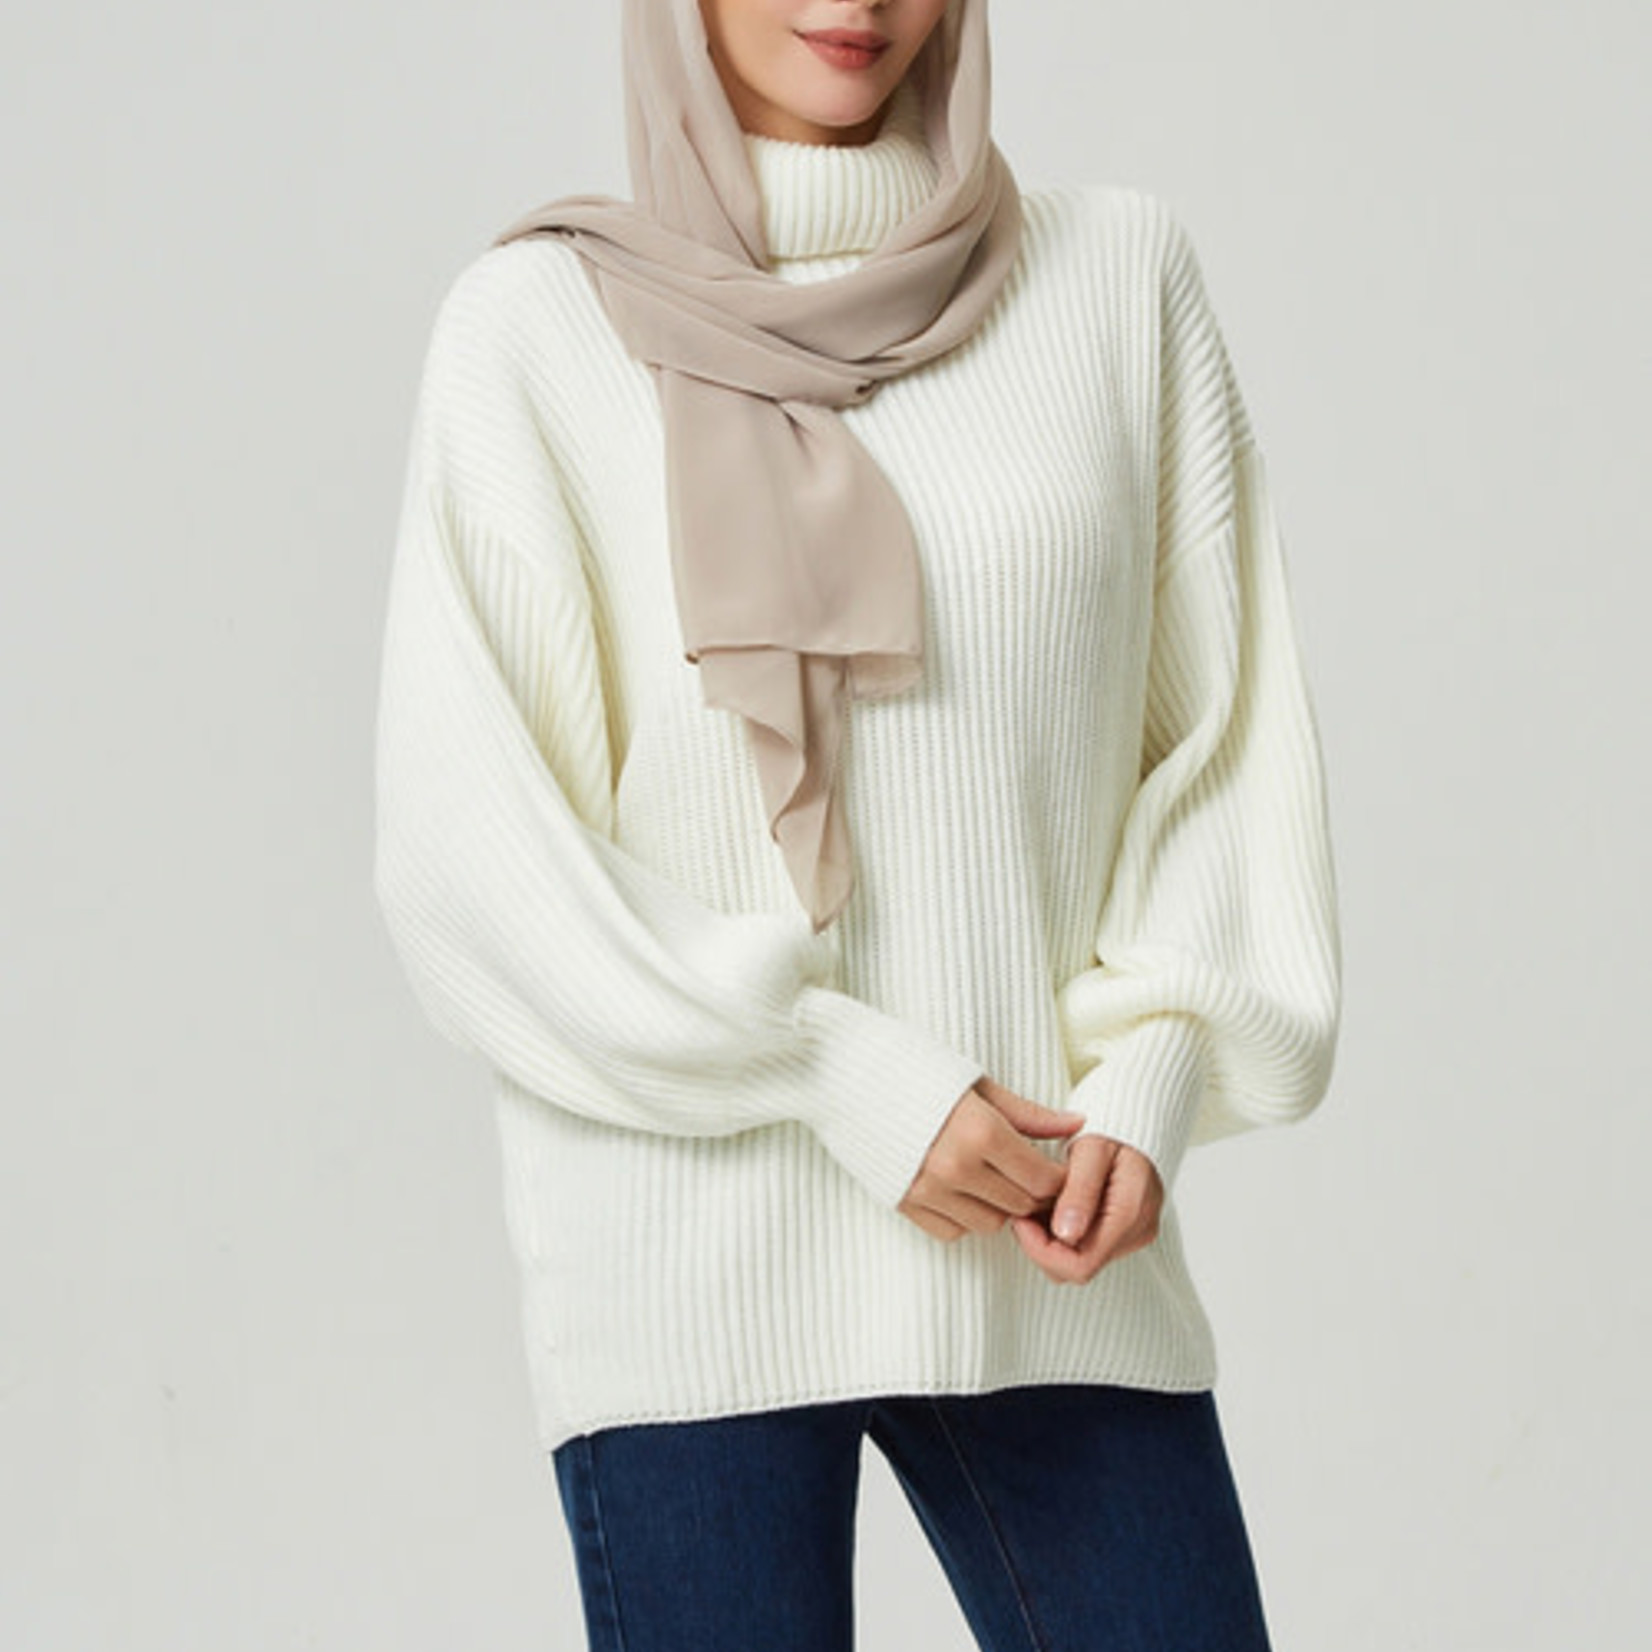 Hijab House White Turtle Knit Sweater